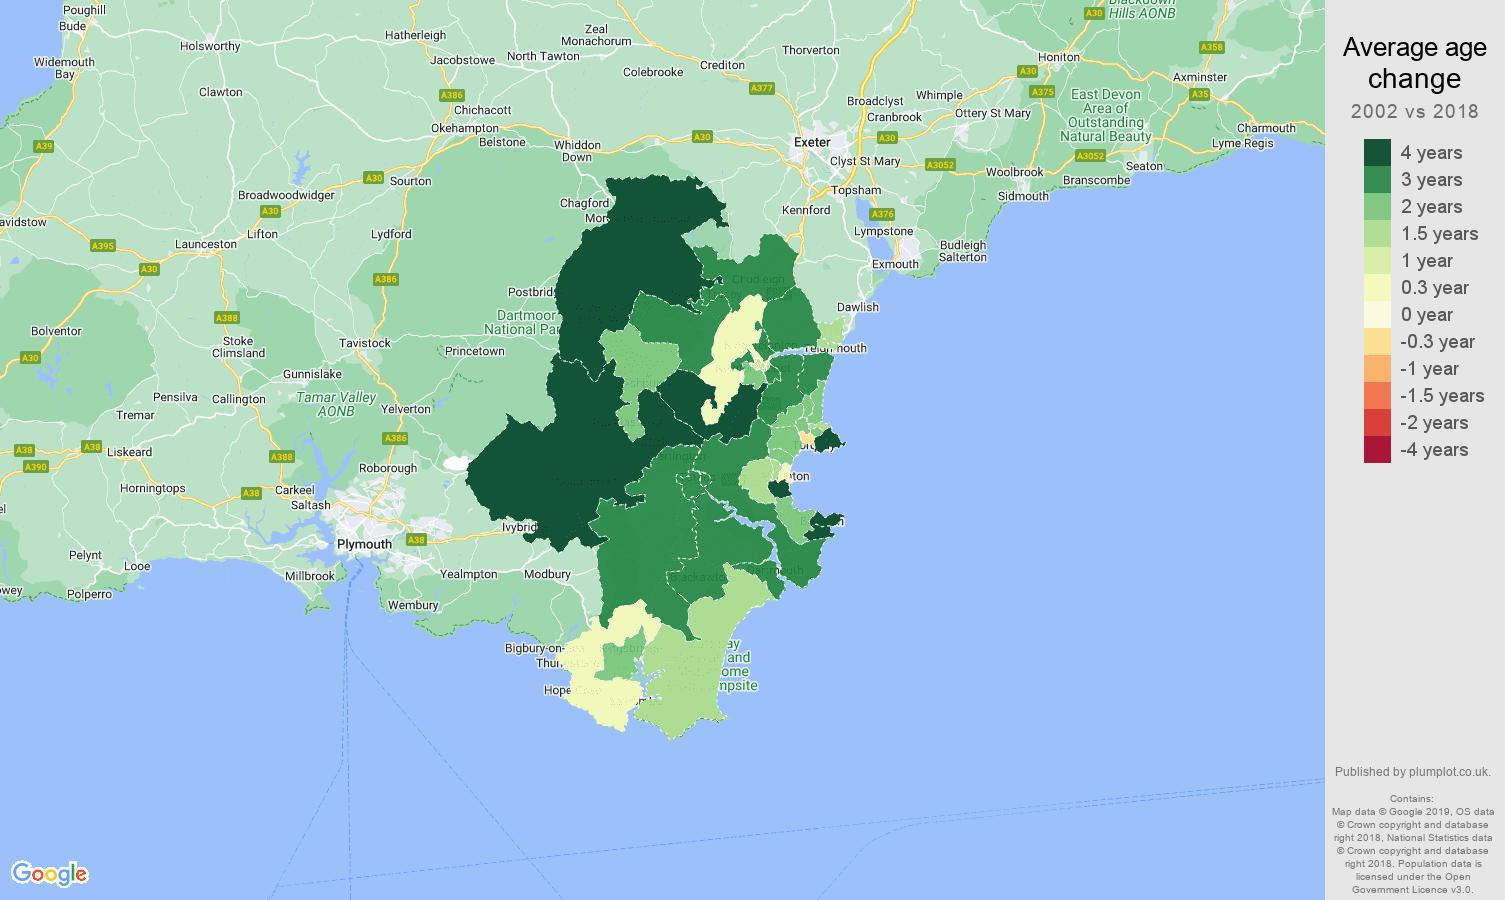 Torquay average age change map